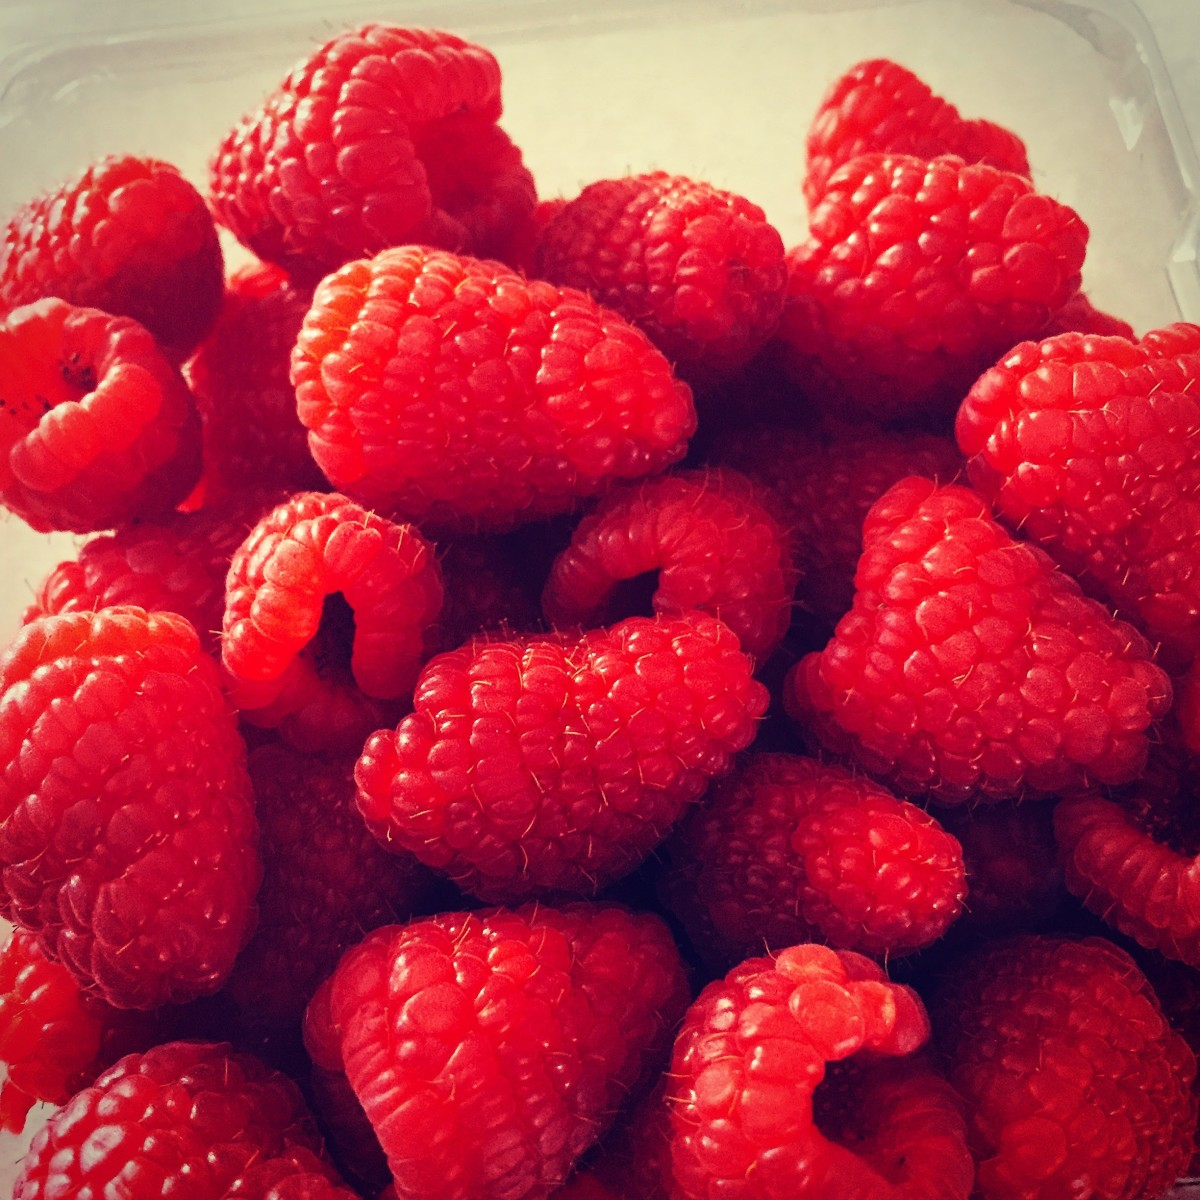 Fresh raspberries waiting to be used as cupcake garnishes.